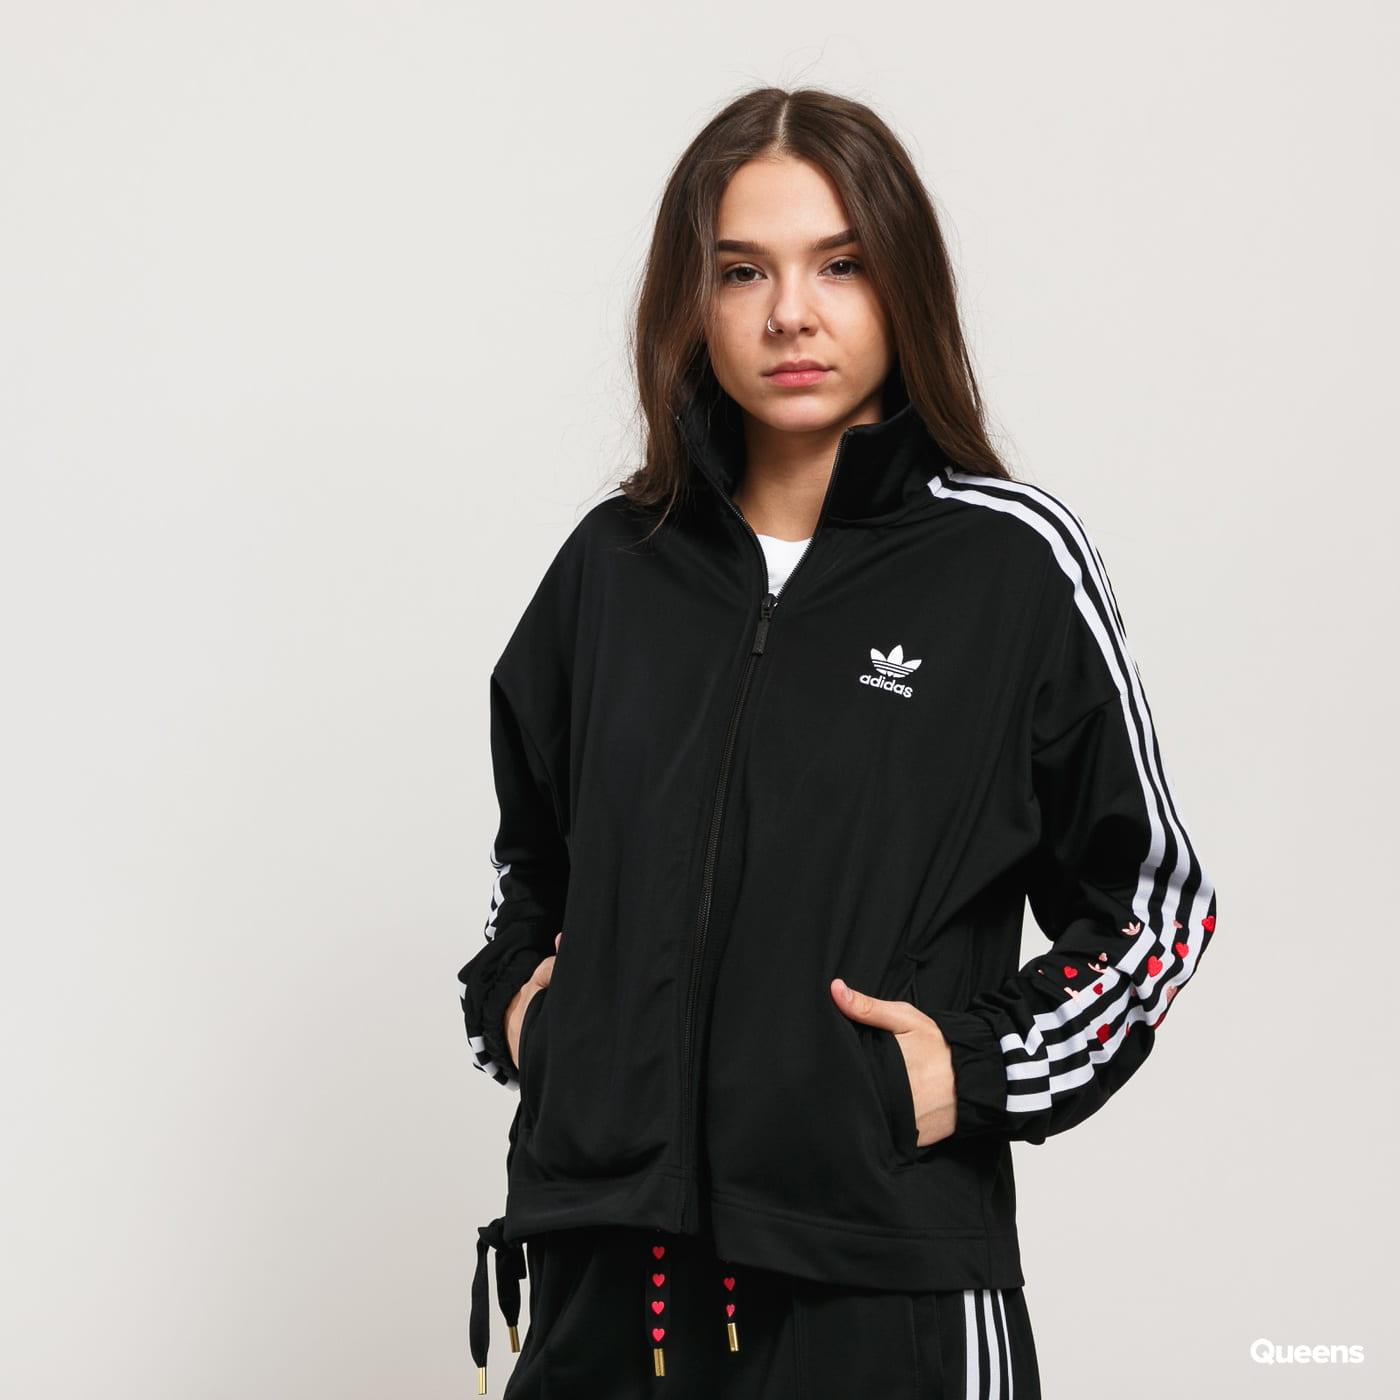 womens adidas originals track top cheap online